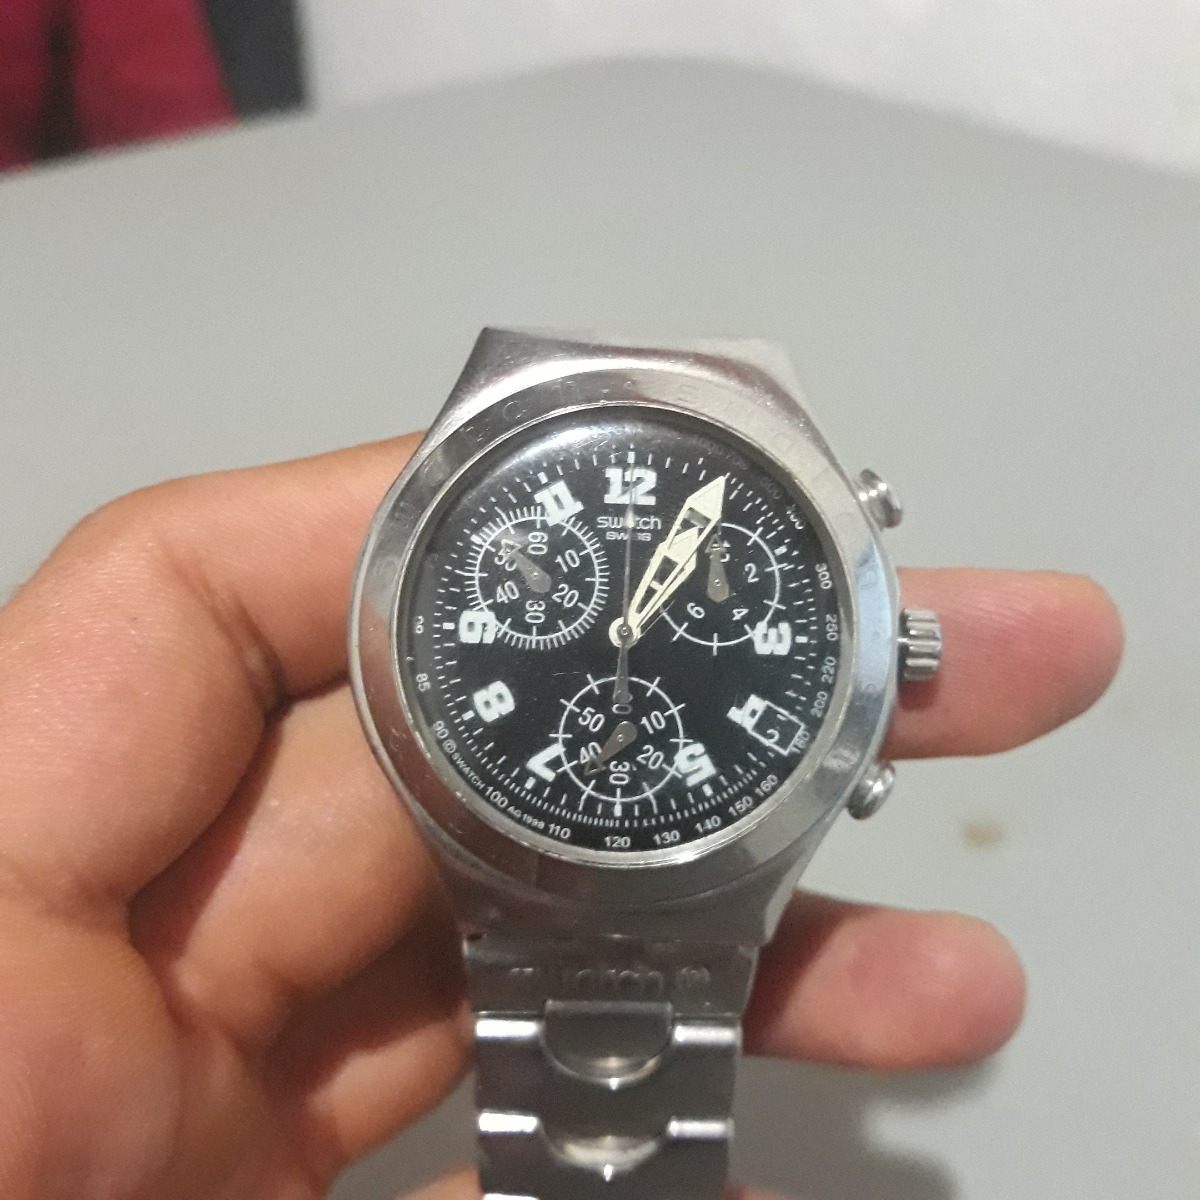 Swatch Irony Jewels 4 V8 Reloj sQthrdxC